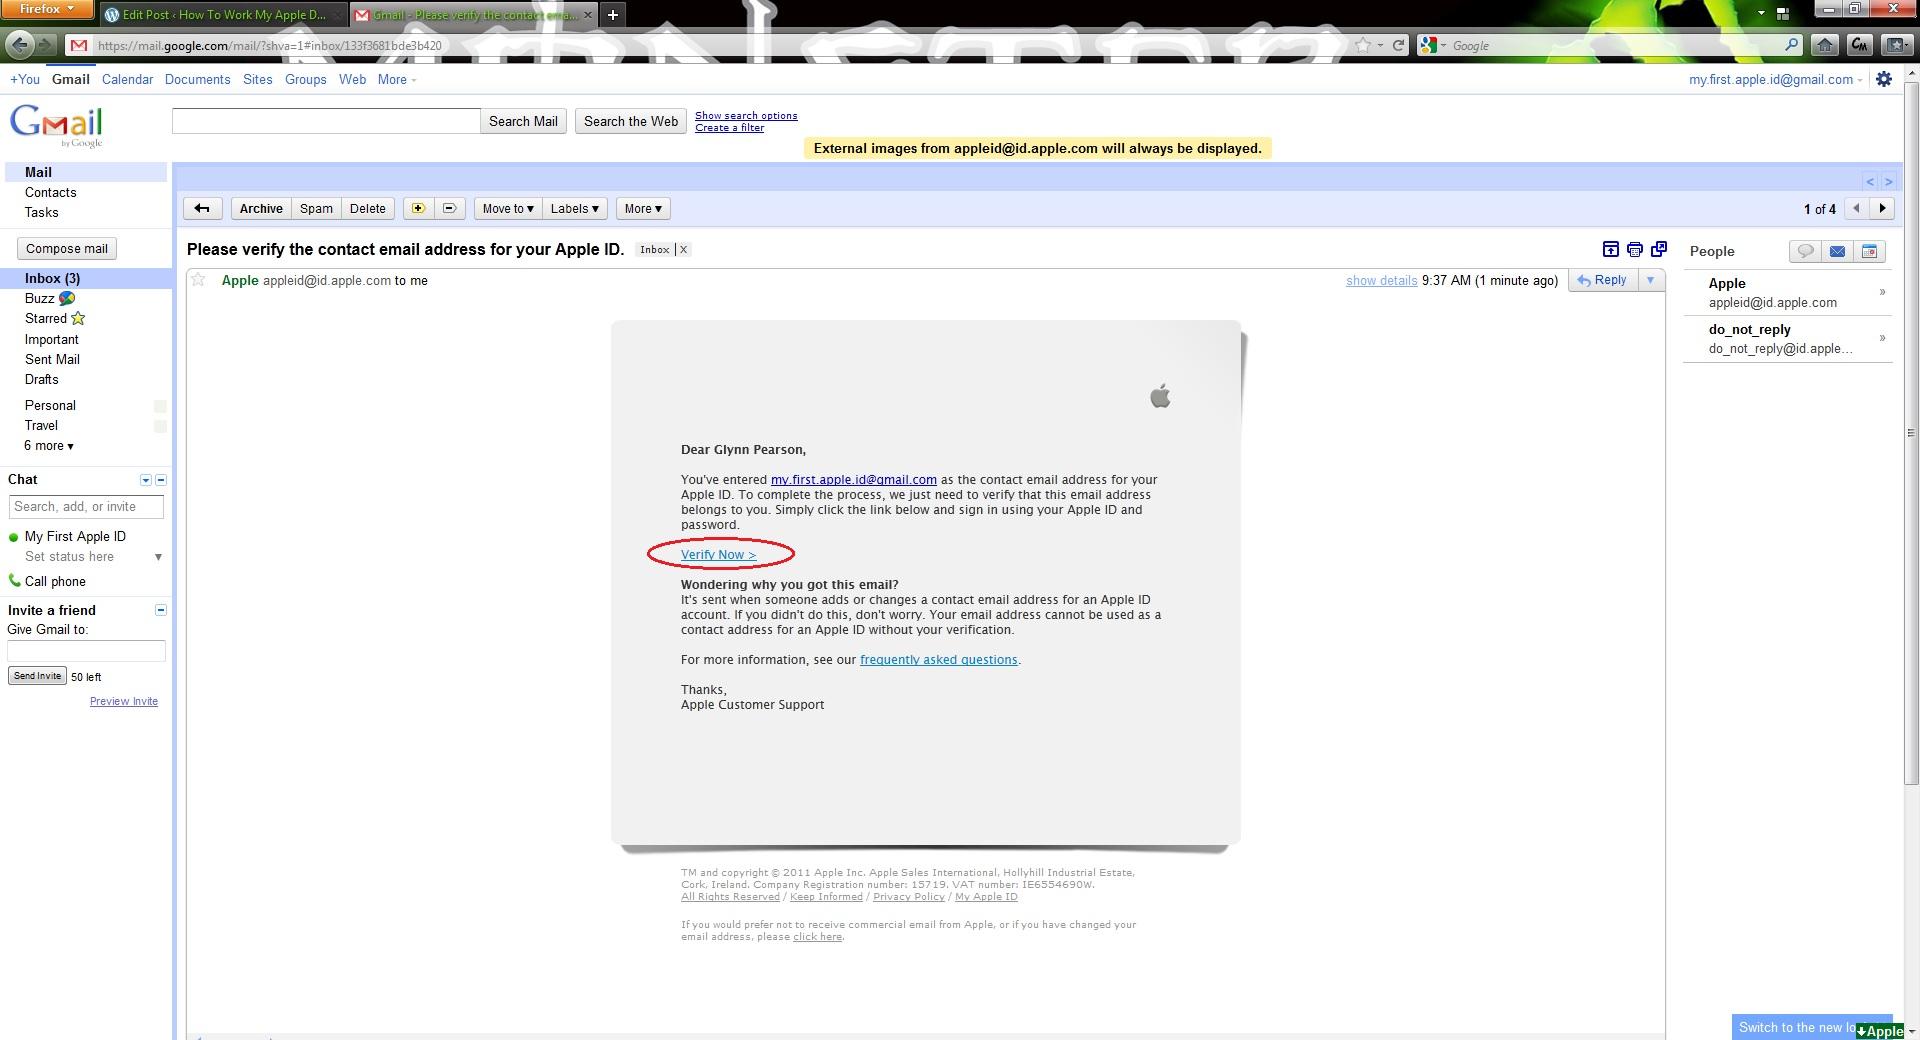 Clicking email link opens Internet Explorer...